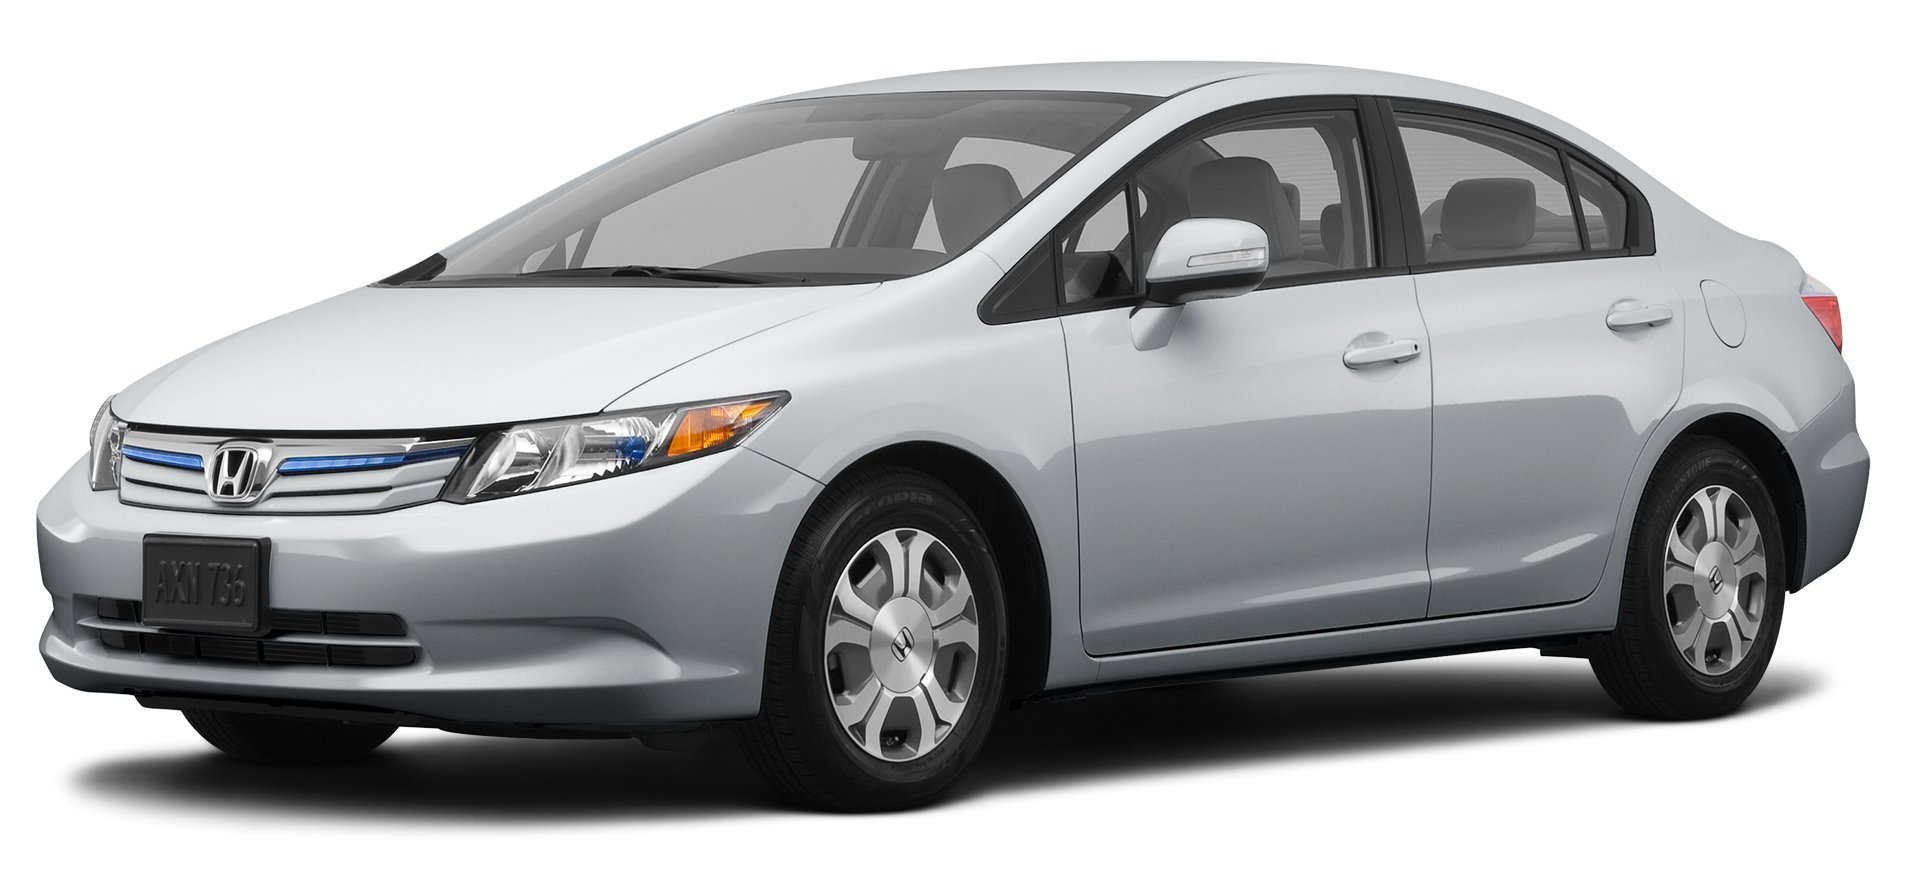 Amazon.com: 2012 Honda Civic Reviews, Images, and Specs: VehiclesAmazon.com